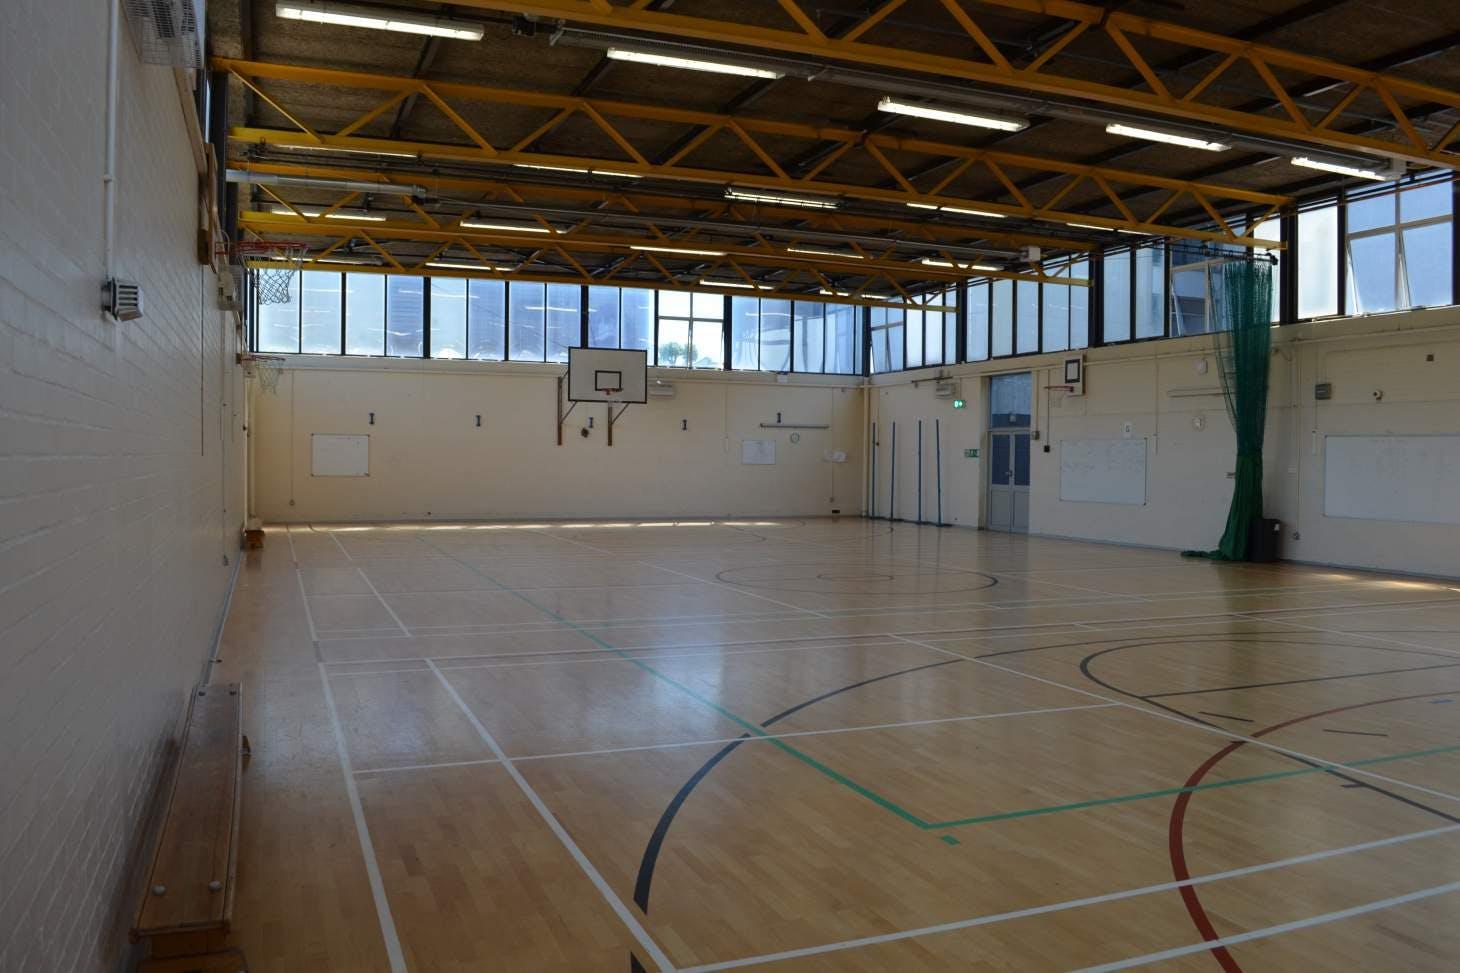 Harris Academy Bermondsey Indoor basketball court